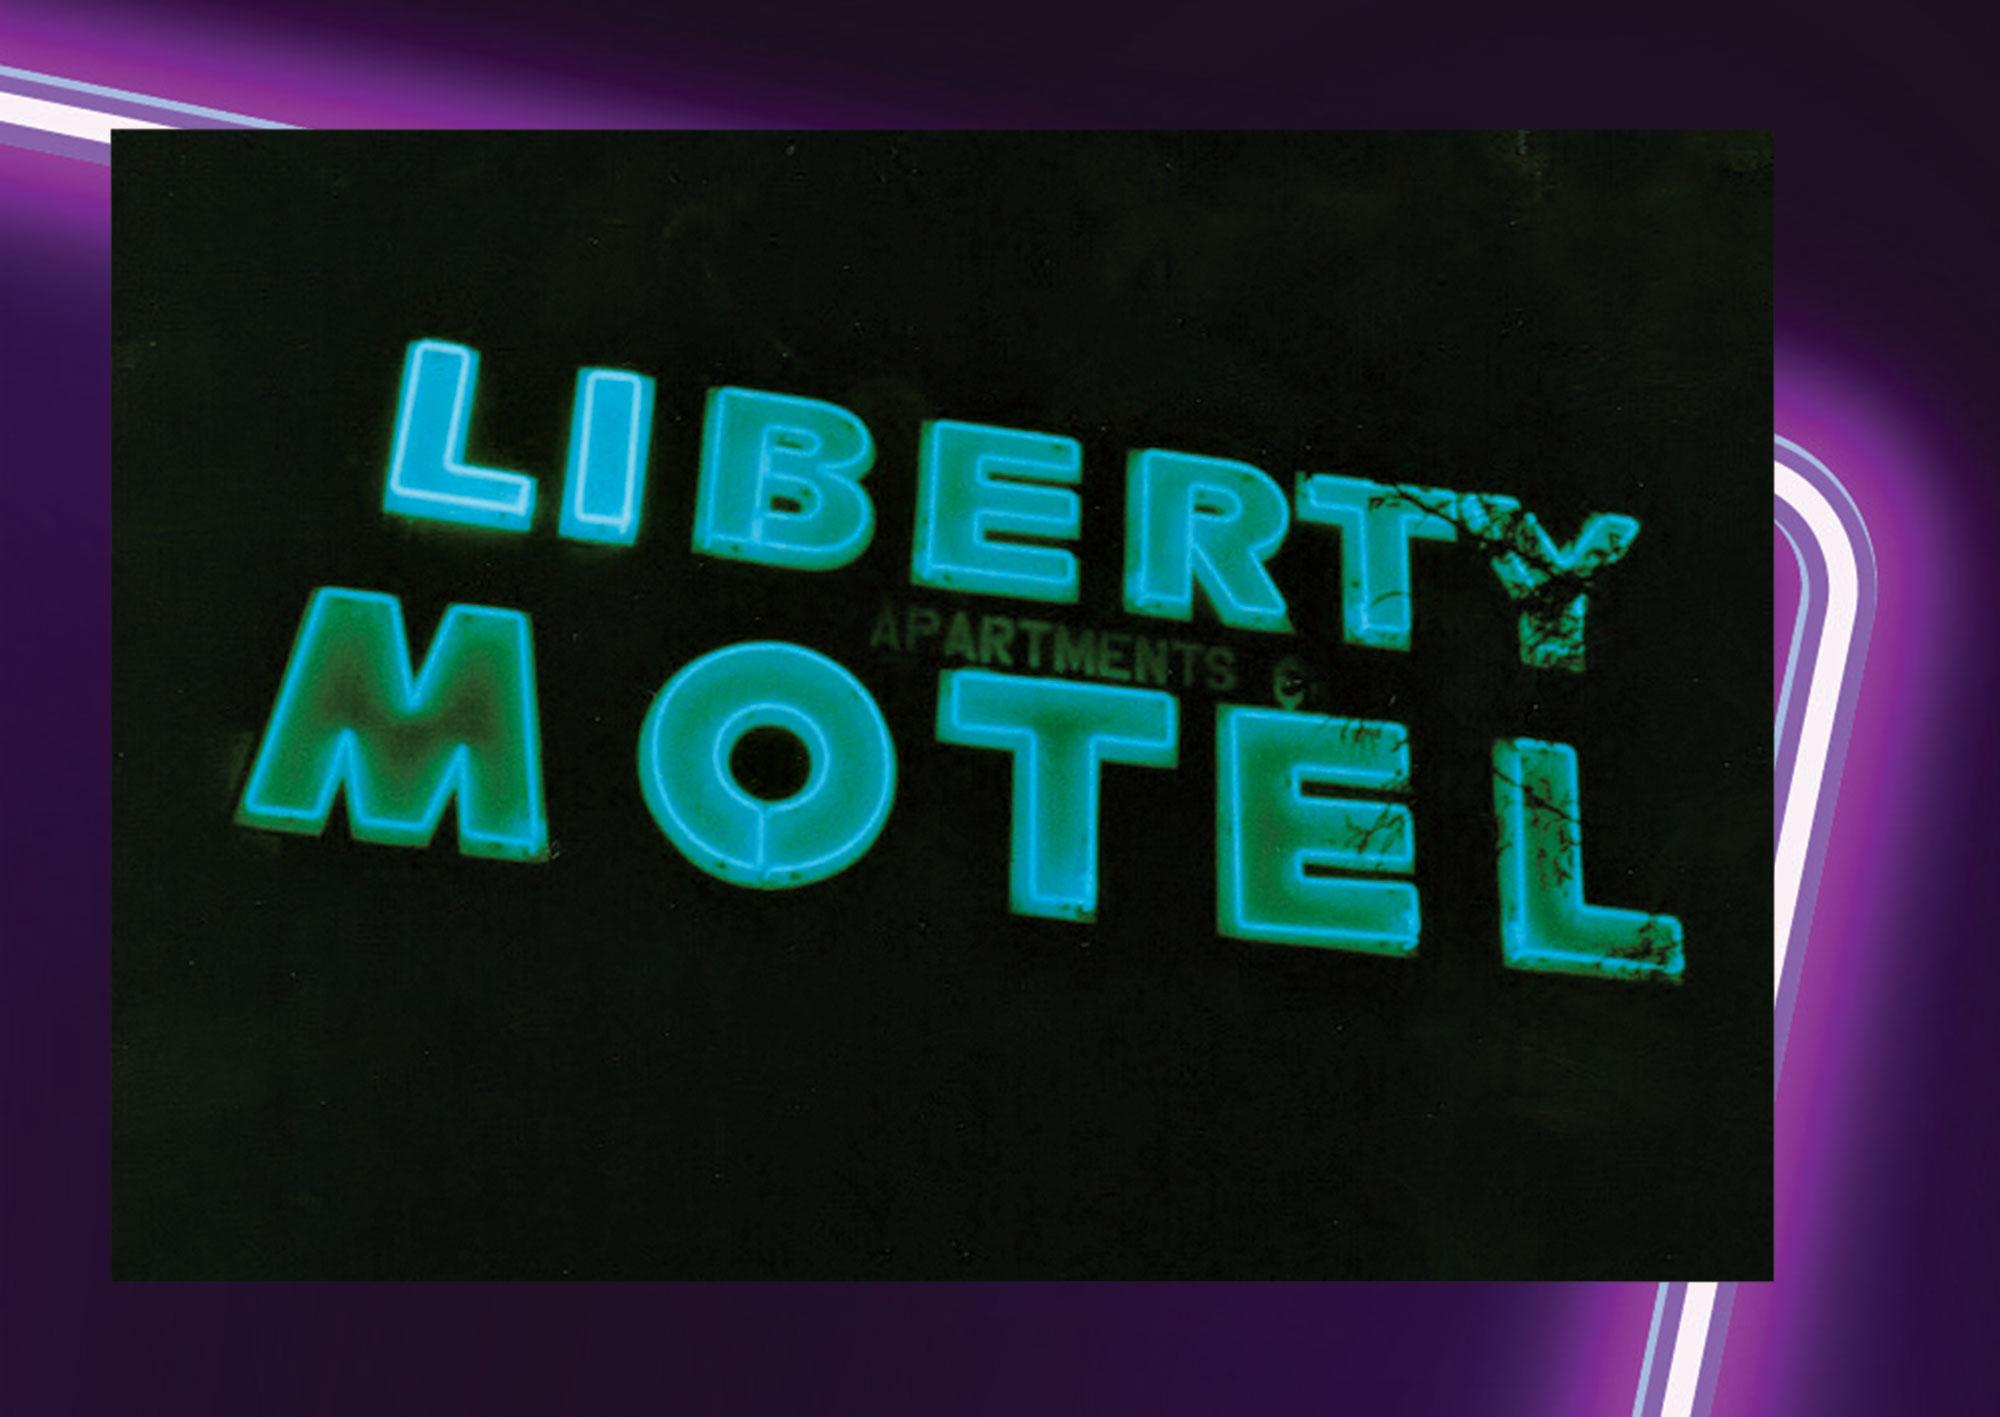 Liberty Motel, 1911 E. Van Buren St., 1991; Photo courtesy Douglas Towne